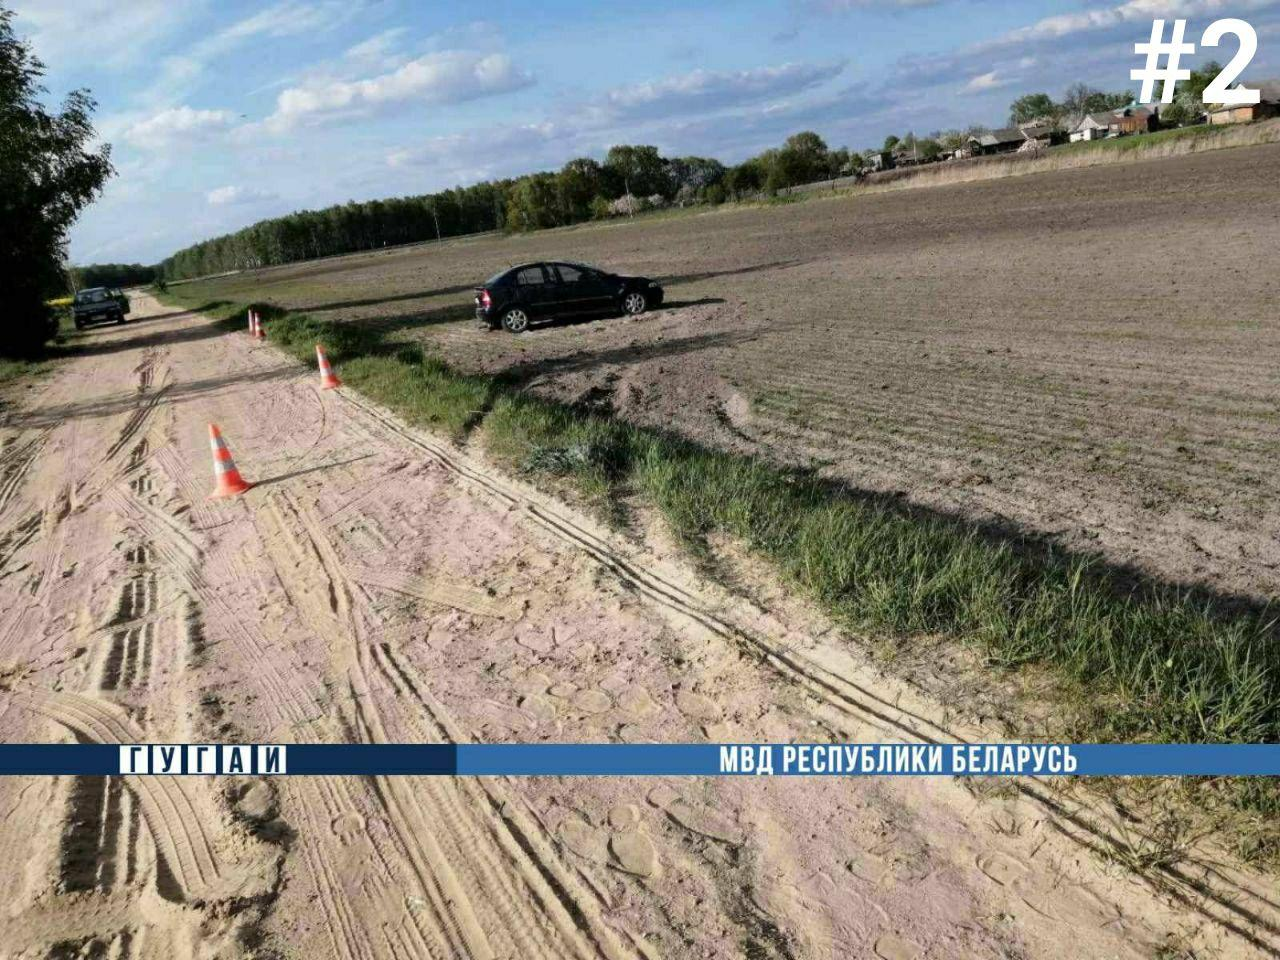 Женщина-водитель «Опель-Астра» в Жабинке на ул. Жмаева съехала на поле и опрокинулась там